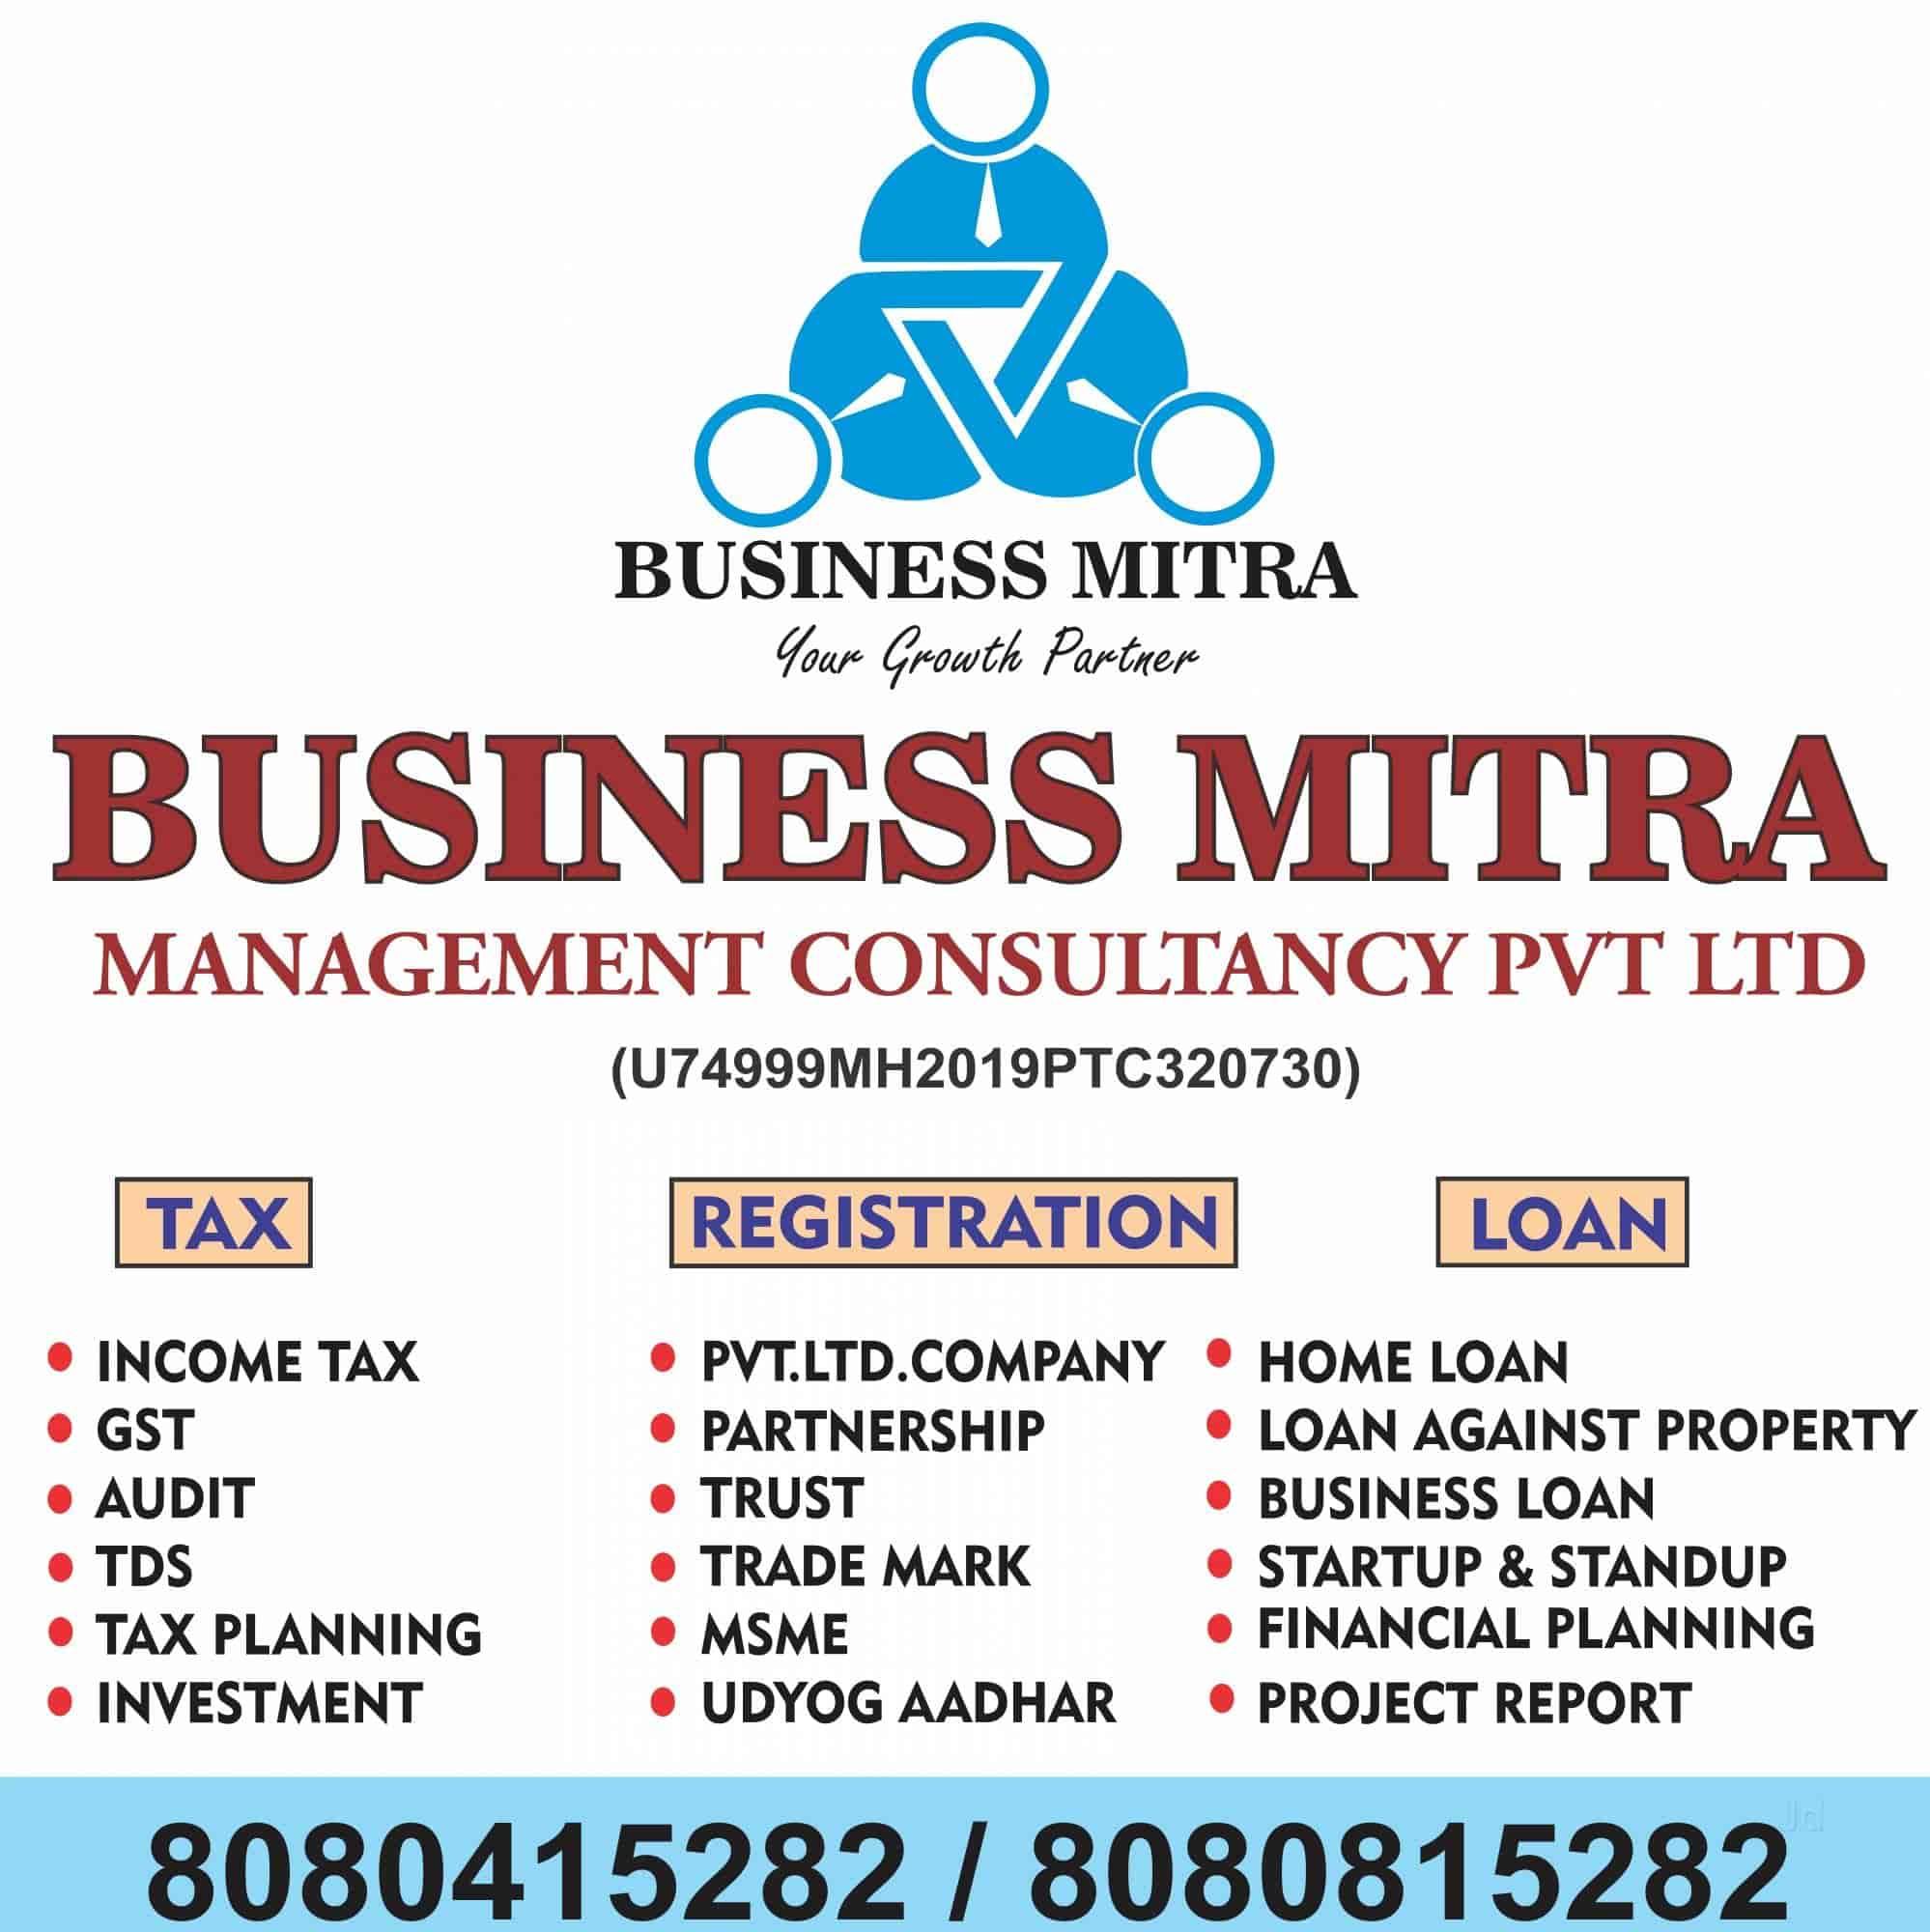 Business Mitra Management Consultancy Pvt Ltd, Kopar